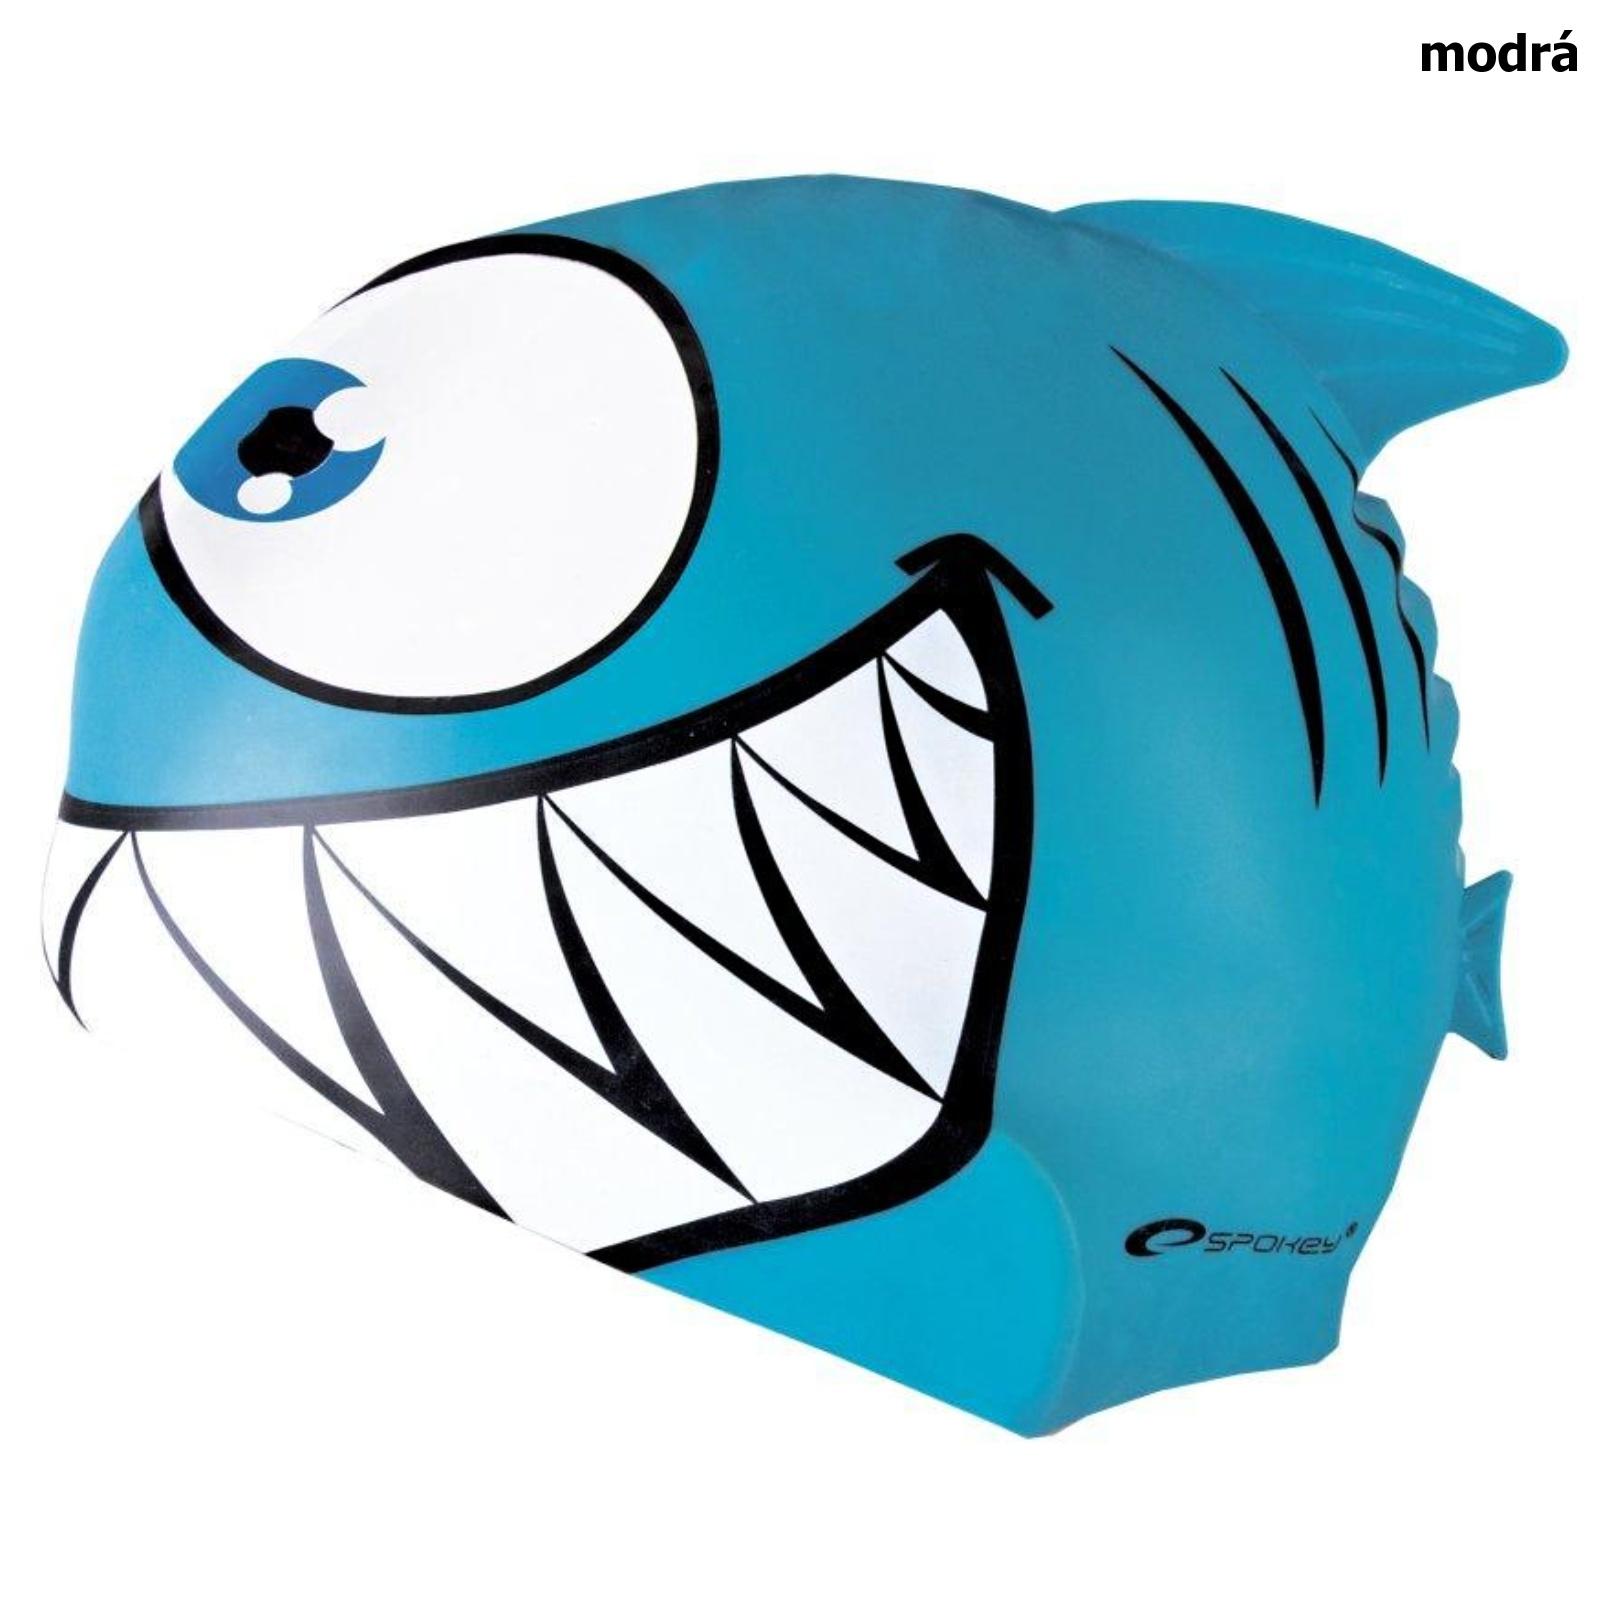 Plavecká čepice SPOKEY Rekinek - modrá